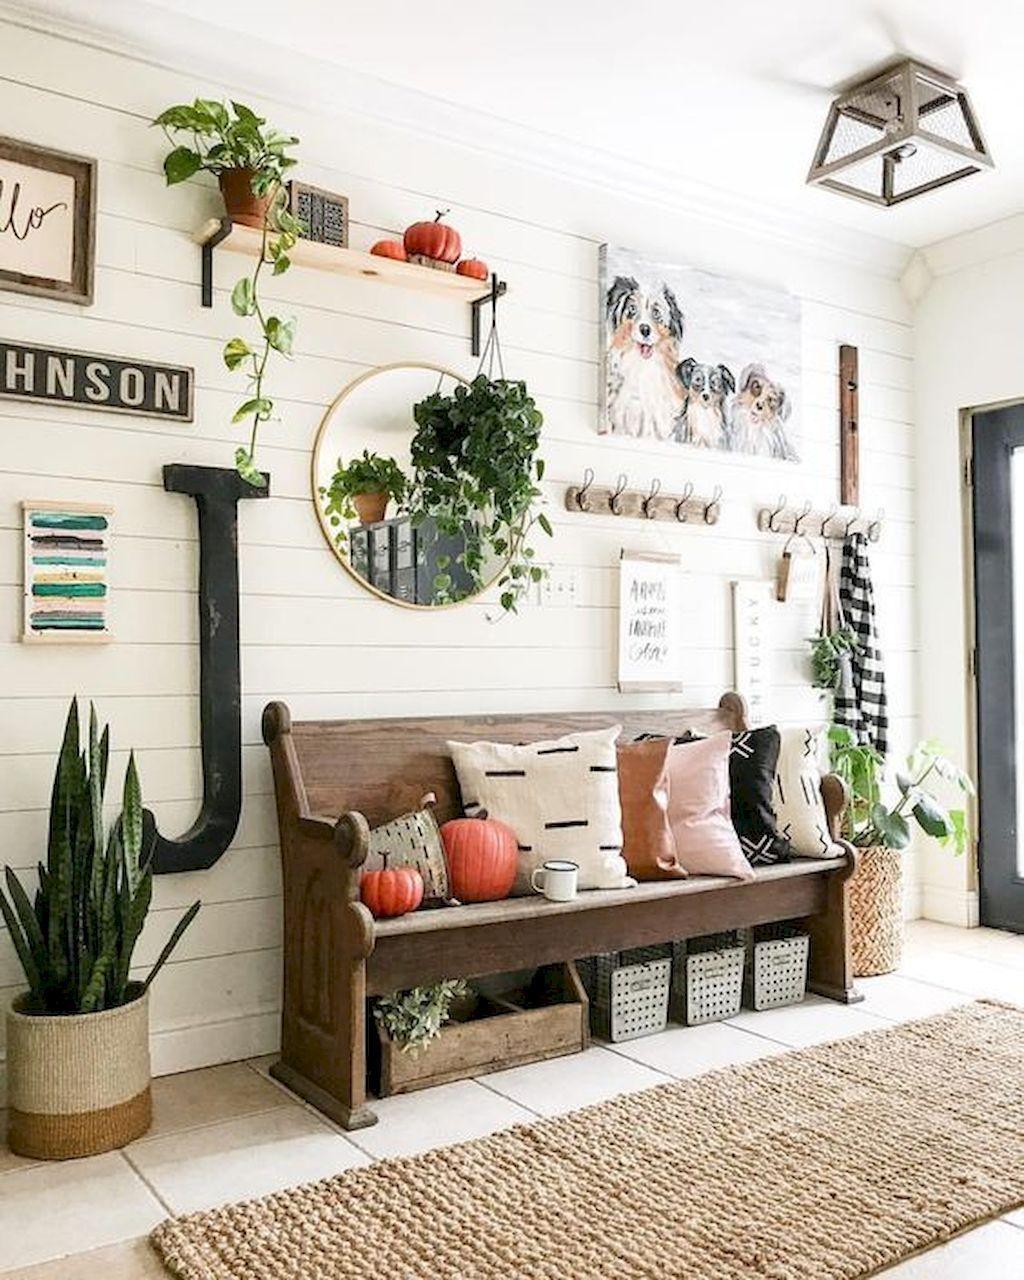 Stunning Farmhouse Interior Design Ideas To Realize Your Dreams 07